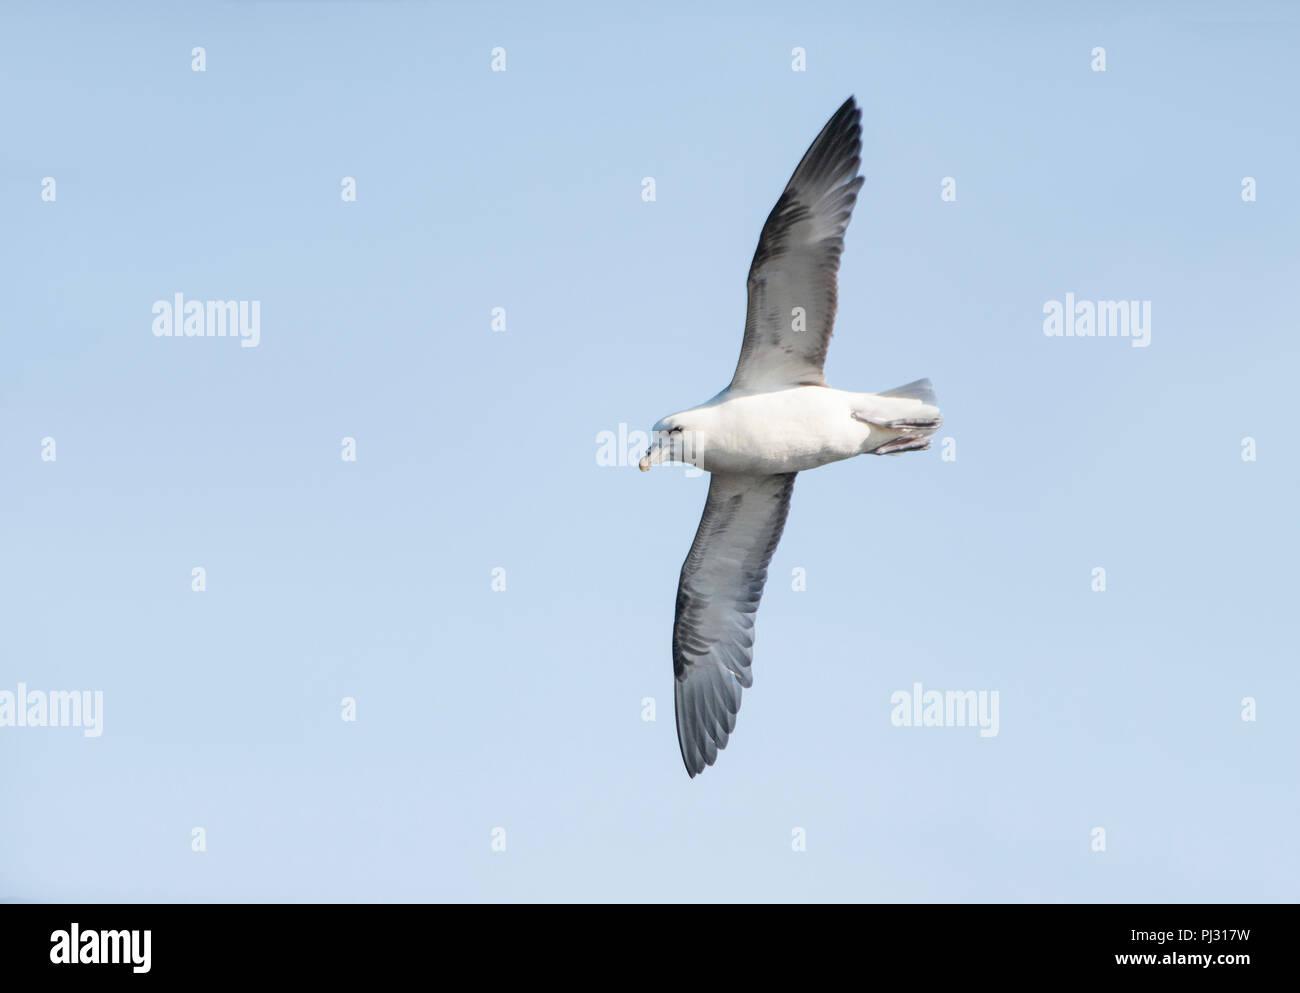 Fulmar, (Fulmarus glacialis), Northern Fulmar or sometimes Arctic Fulmar, in flight, Whitby coast, Yorkshire, British Isles Stock Photo